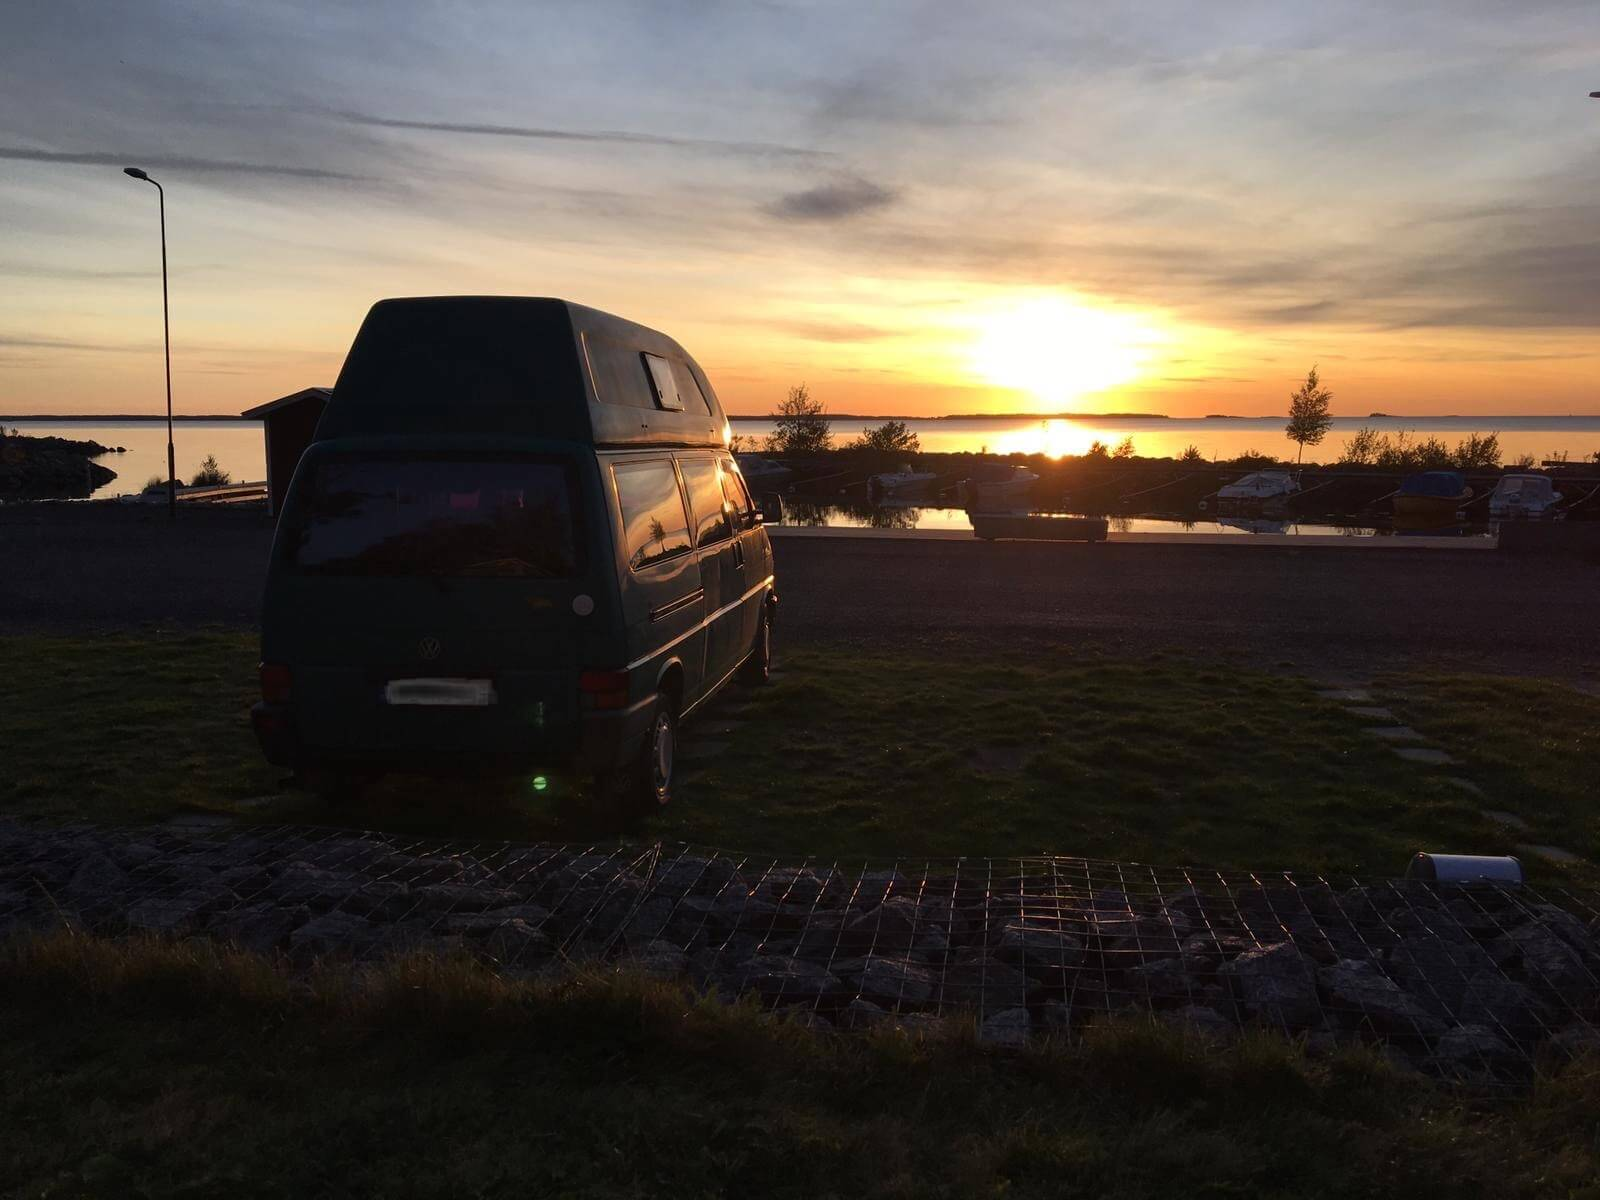 VW Bus T4 Manfred California gruen Camper Bulli mieten Rostock bincampen Sonnenuntergang Sommer Freiheit Natur